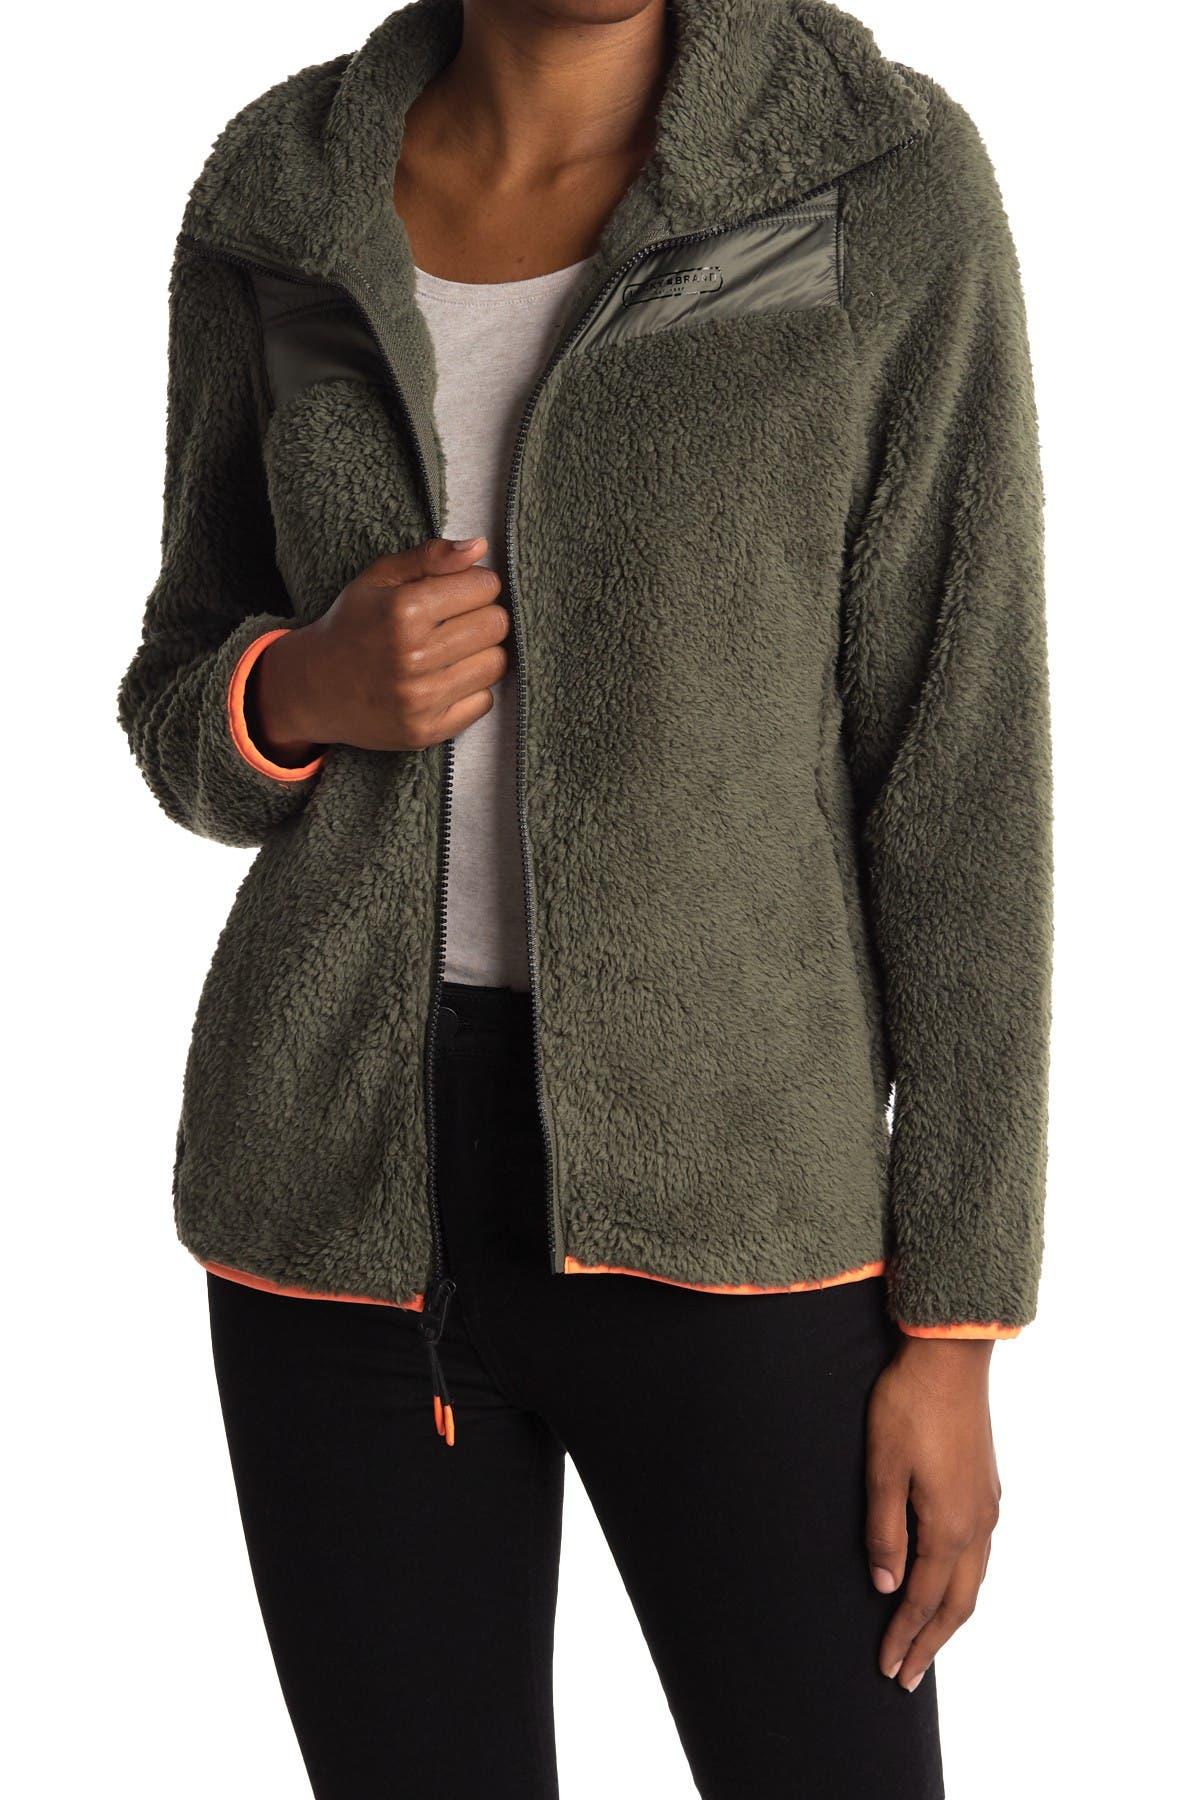 Image of Lucky Brand Faux Shearling Fleece Zip Jacket